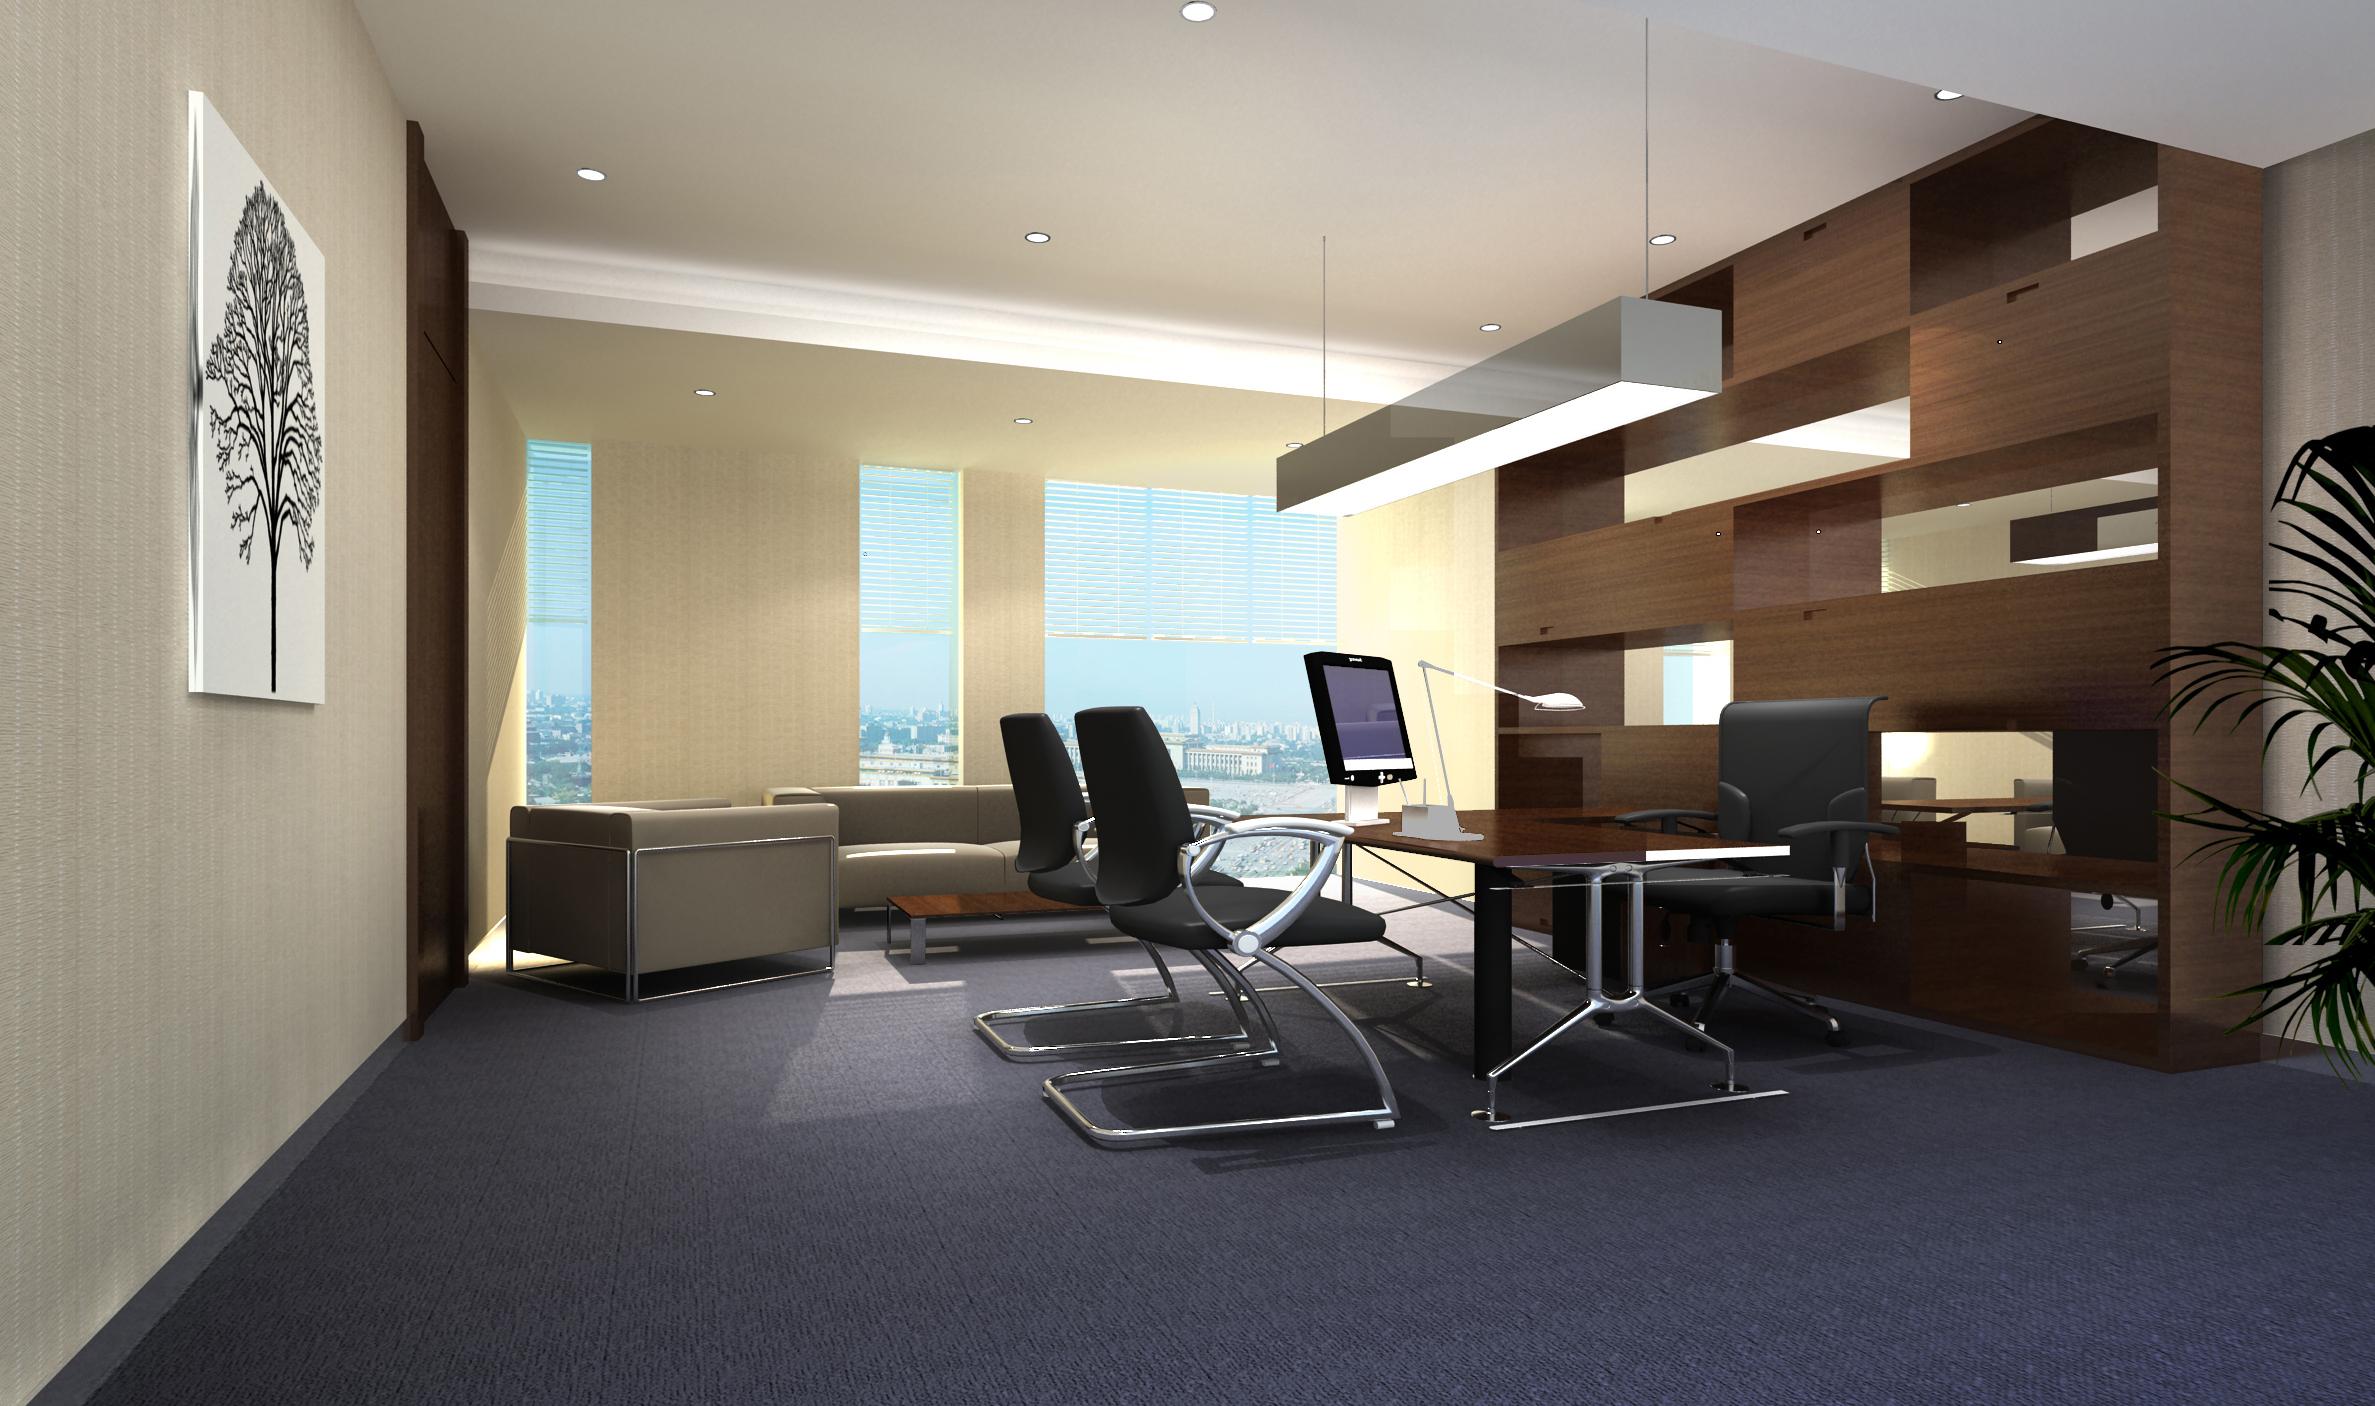 office 044 3d model max 137279